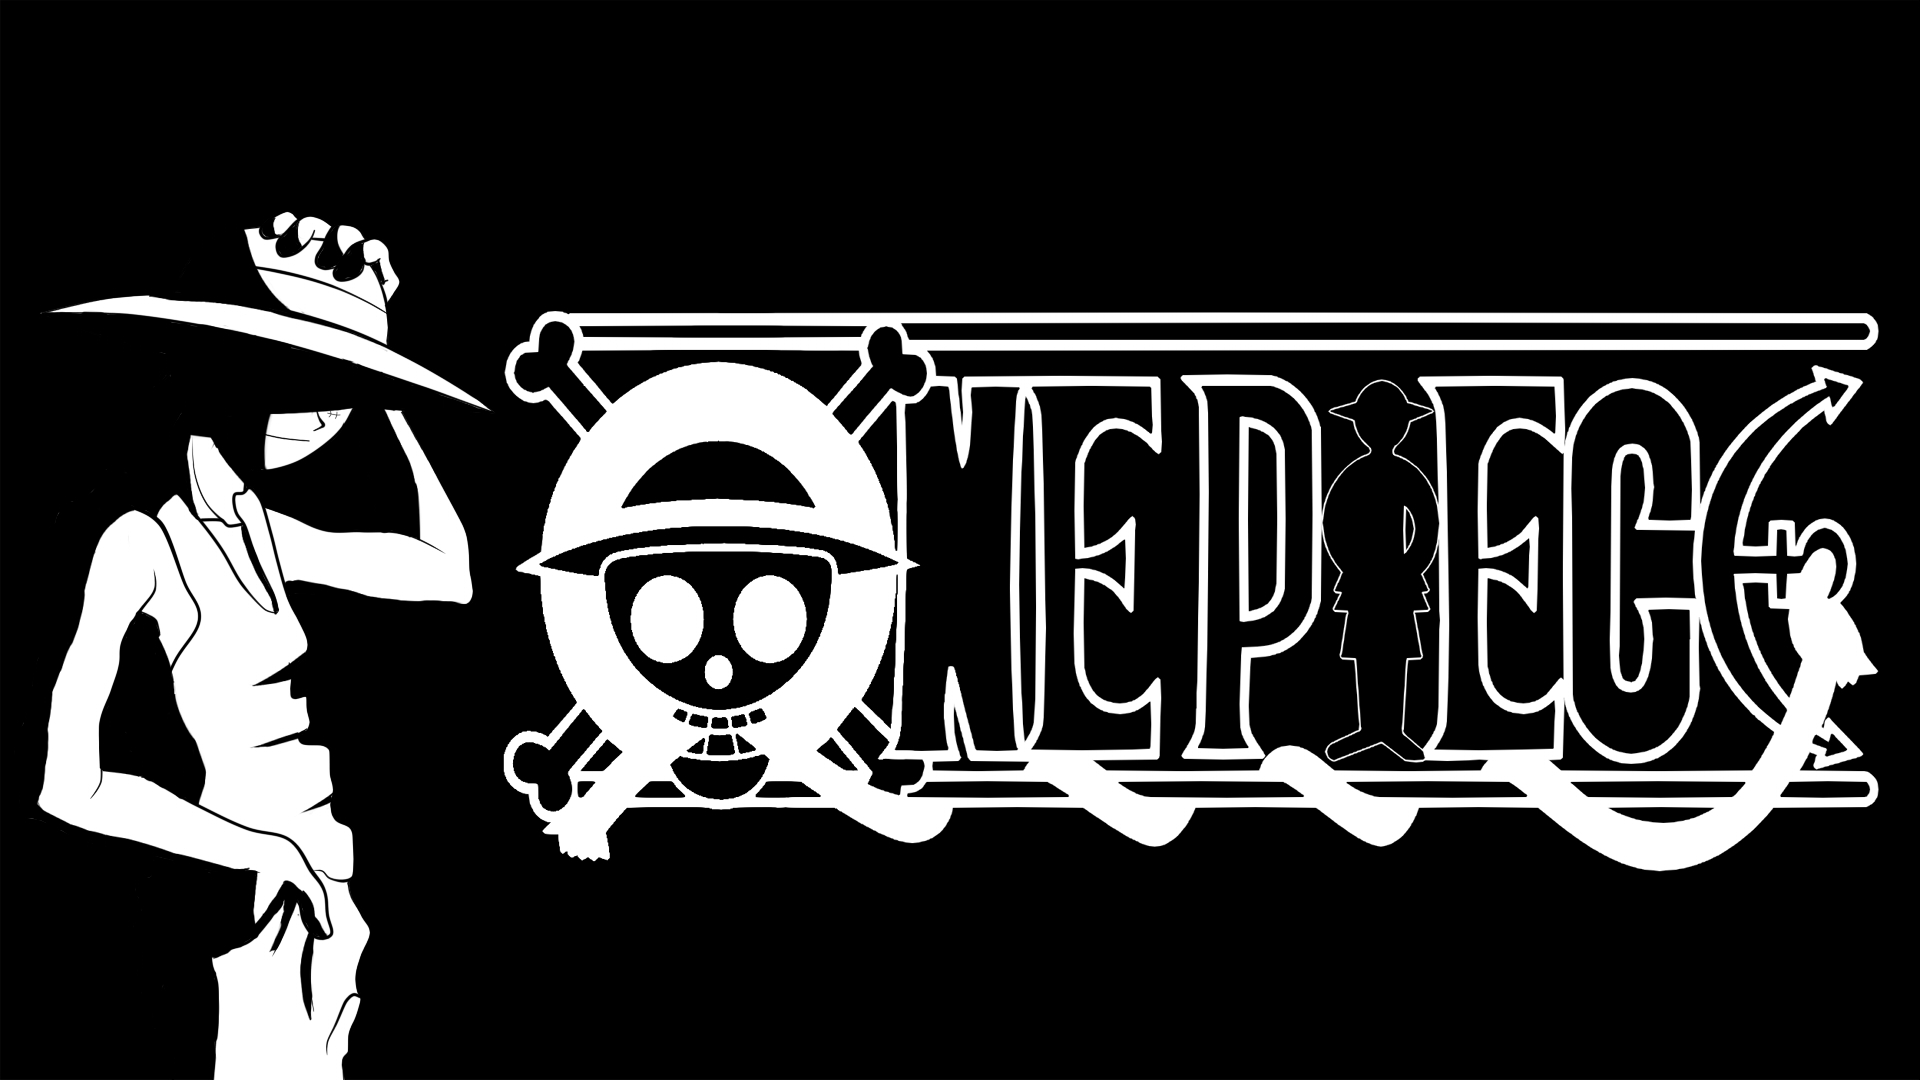 One Piece Logo Wallpaper - WallpaperSafari